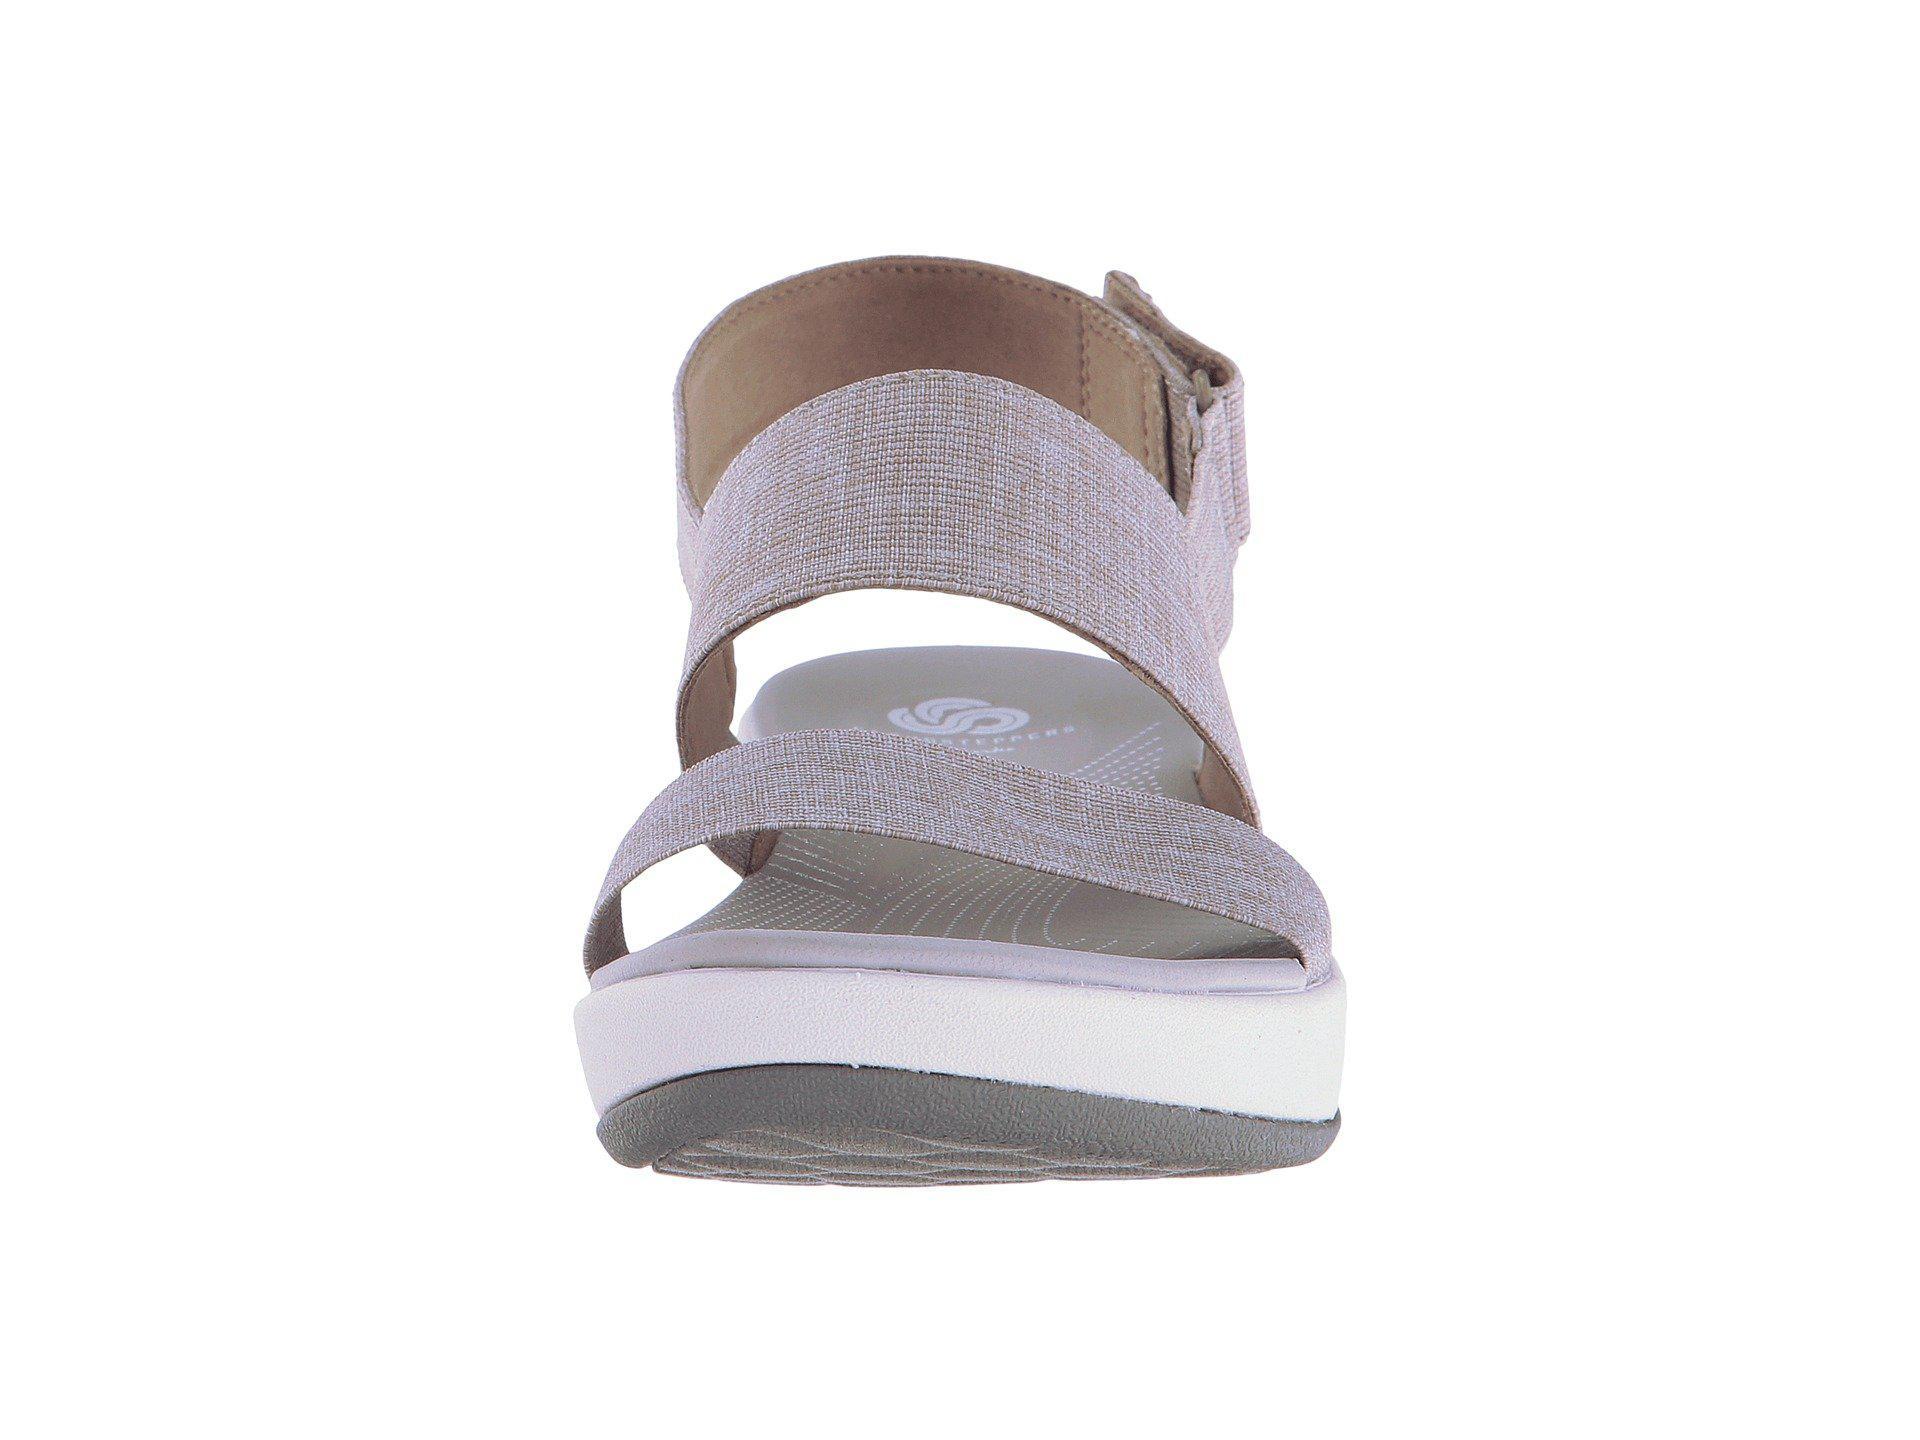 Clarks Synthetic Arla Jacory Black Solid Women S Sandals